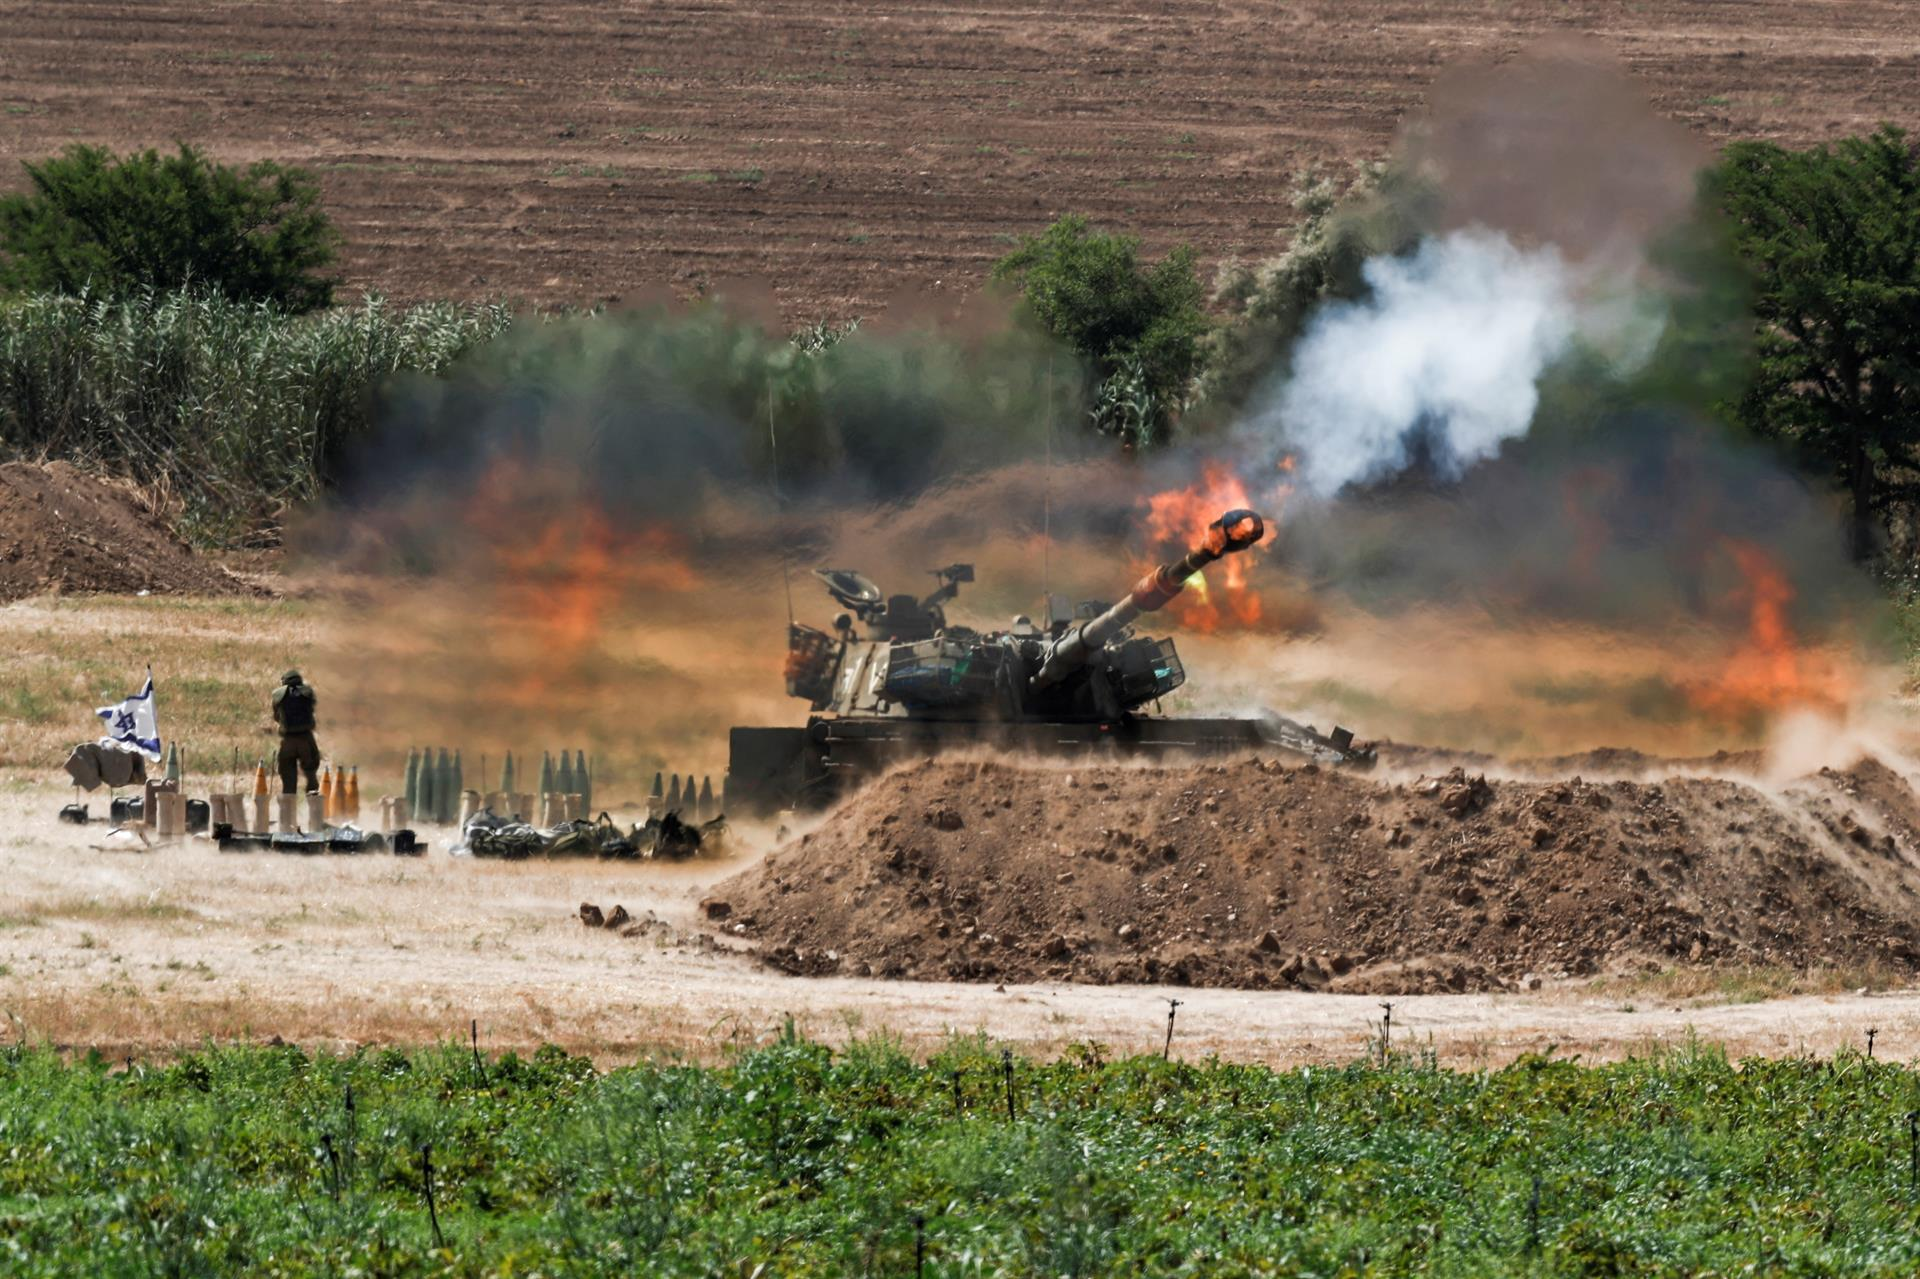 Artilharia israelense bombardeia alvos na Faixa de Gaza